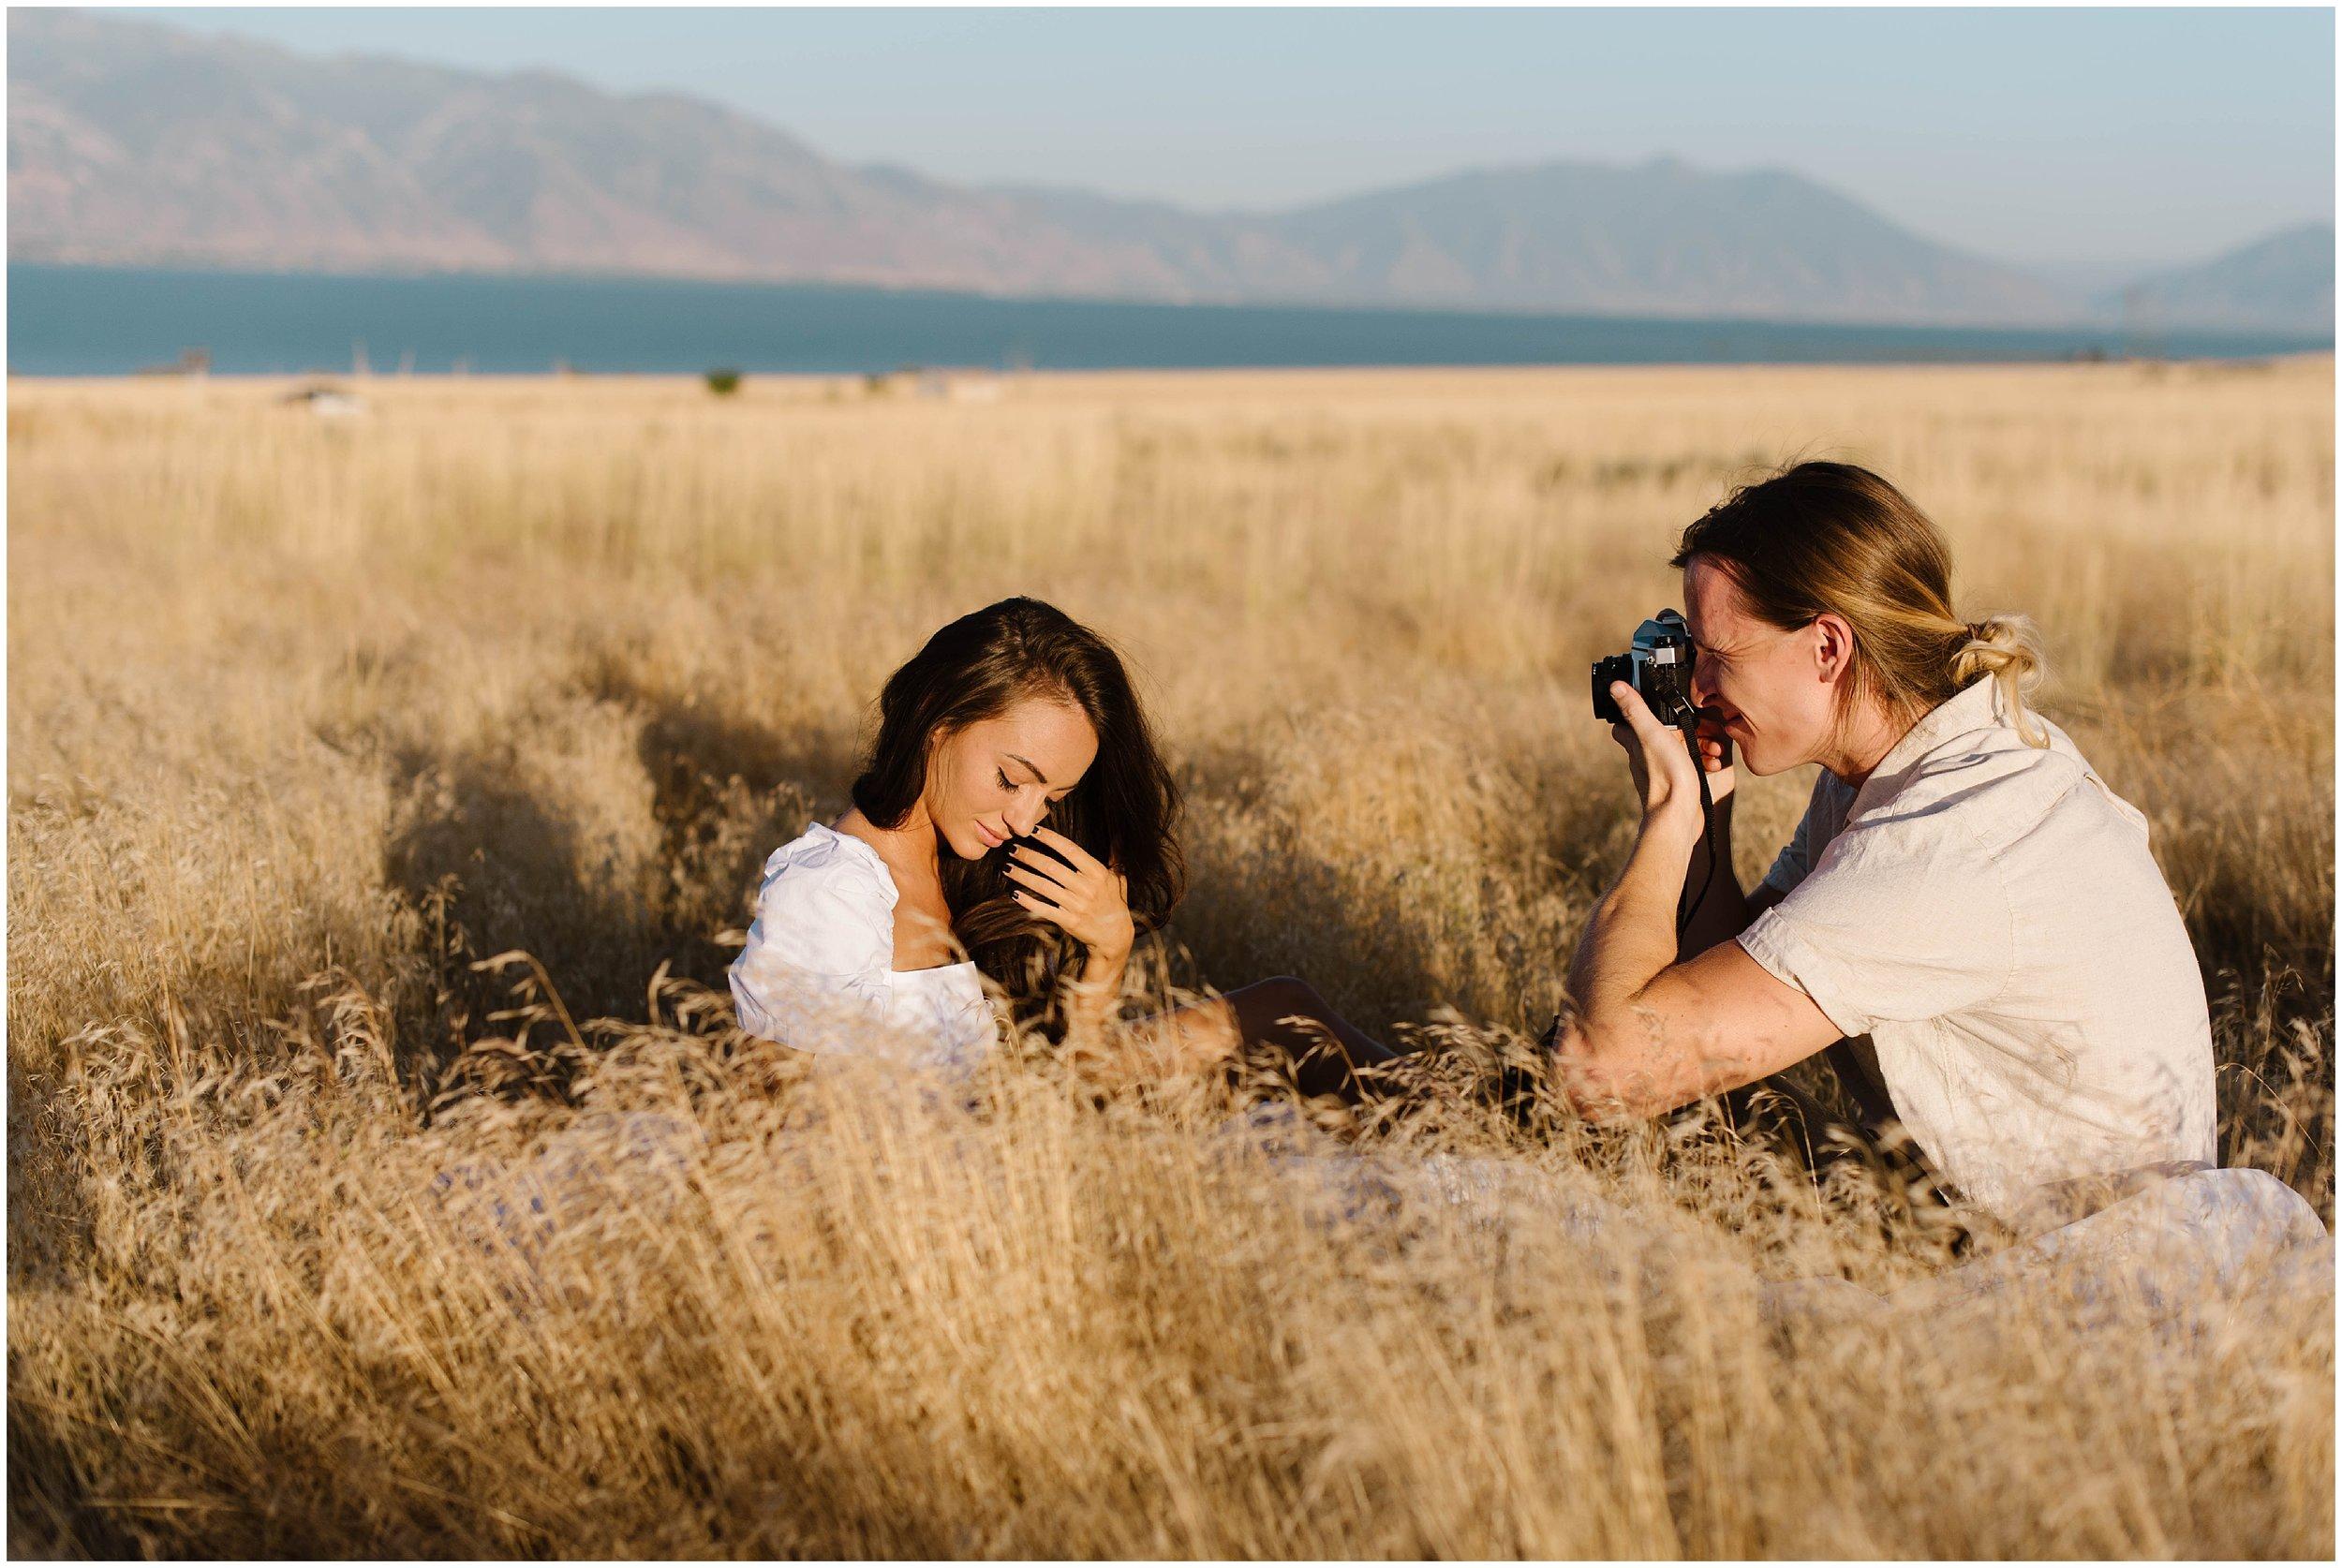 amber-lynne-photography-utah-engagement-photography.jpg5.jpg